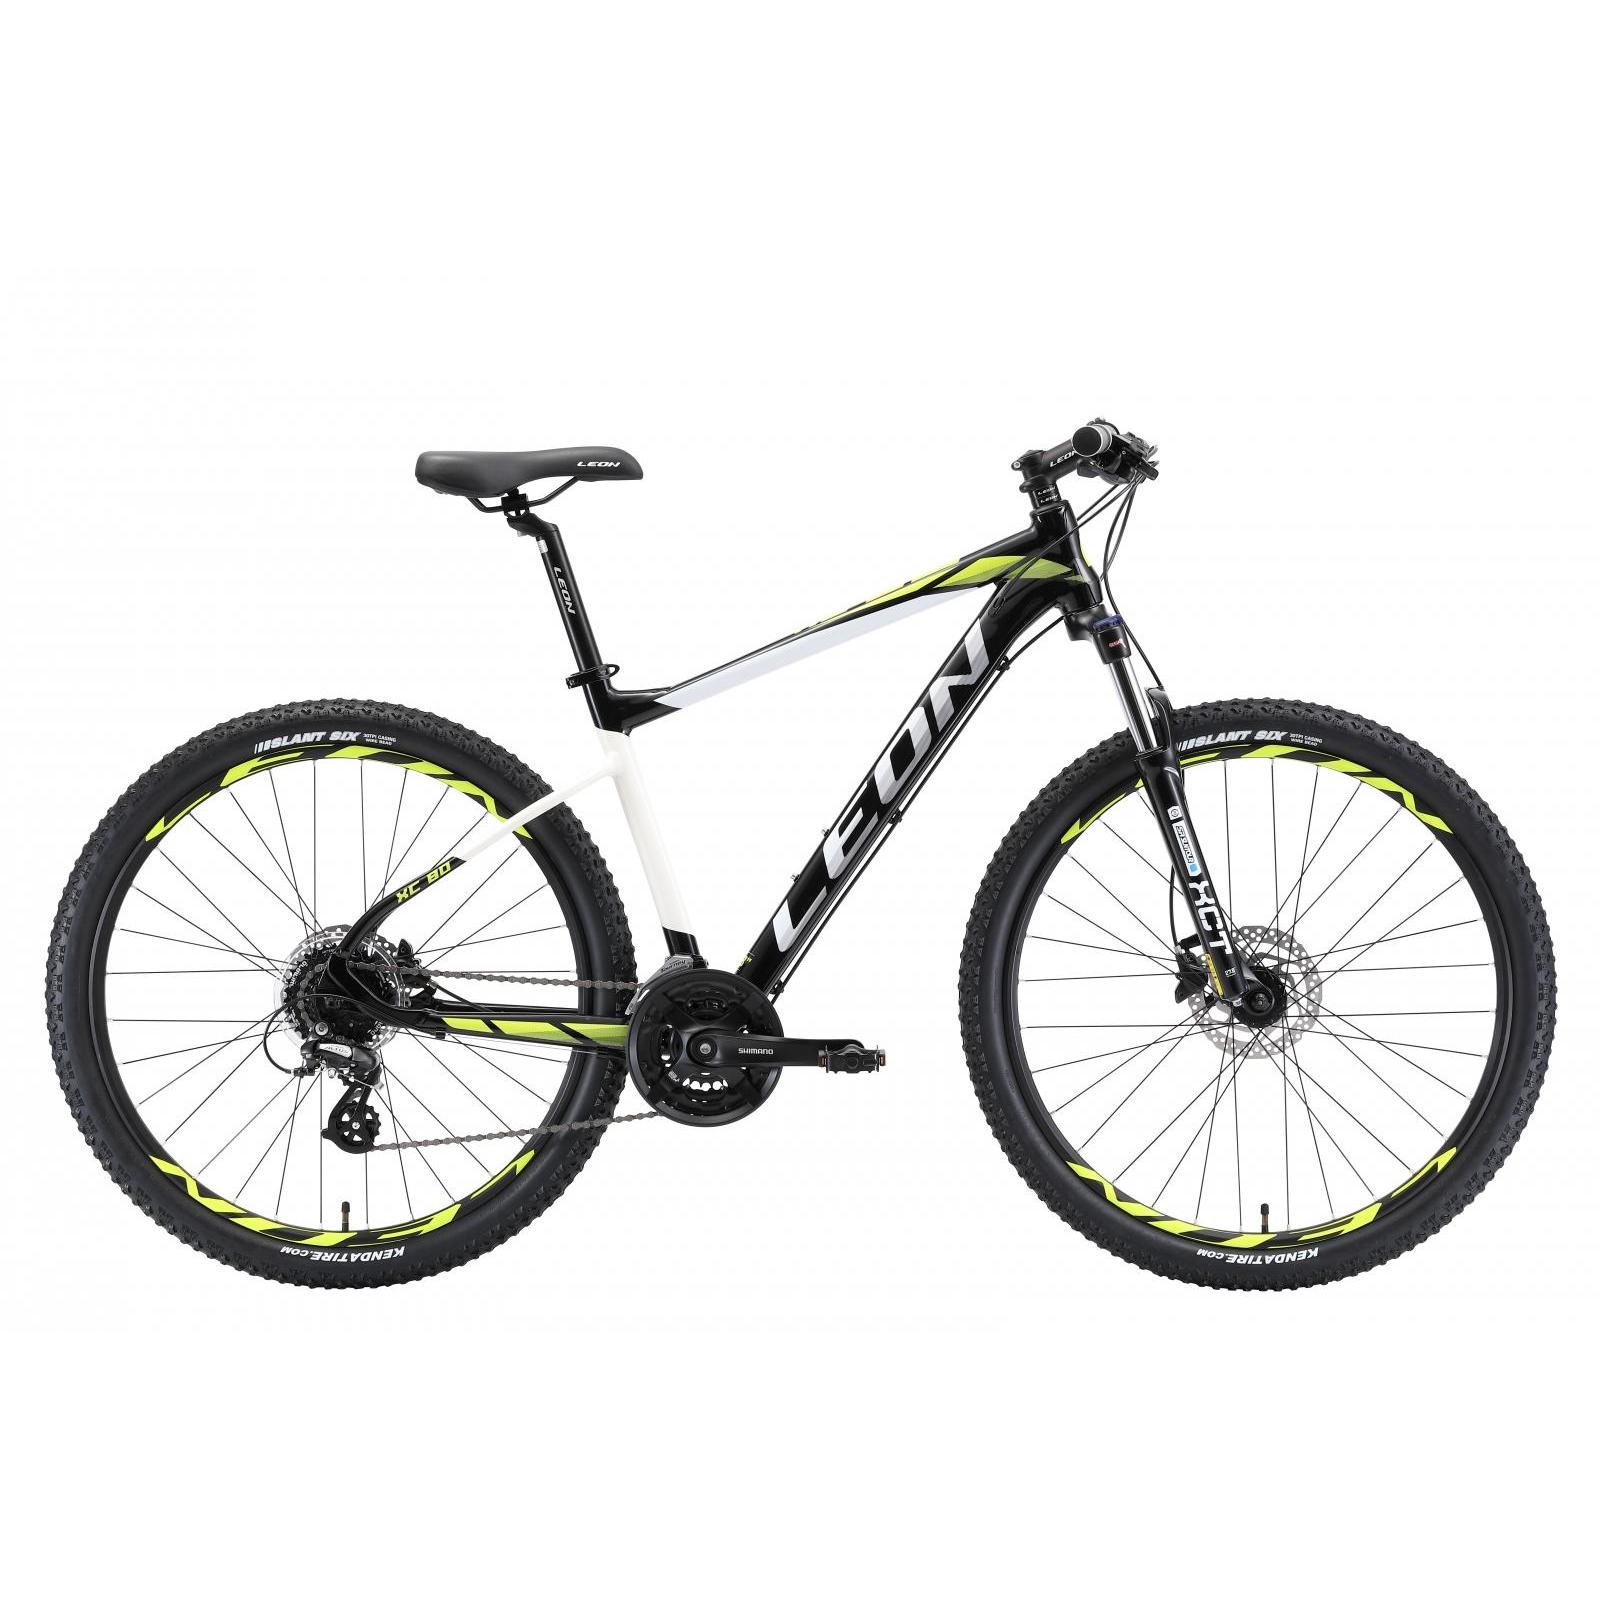 "Велосипед Leon 27.5"" XC-80 2018 AM Hydraulic lock out 14G HDD рама-20"" Al (OPS-LN-27.5-023)"